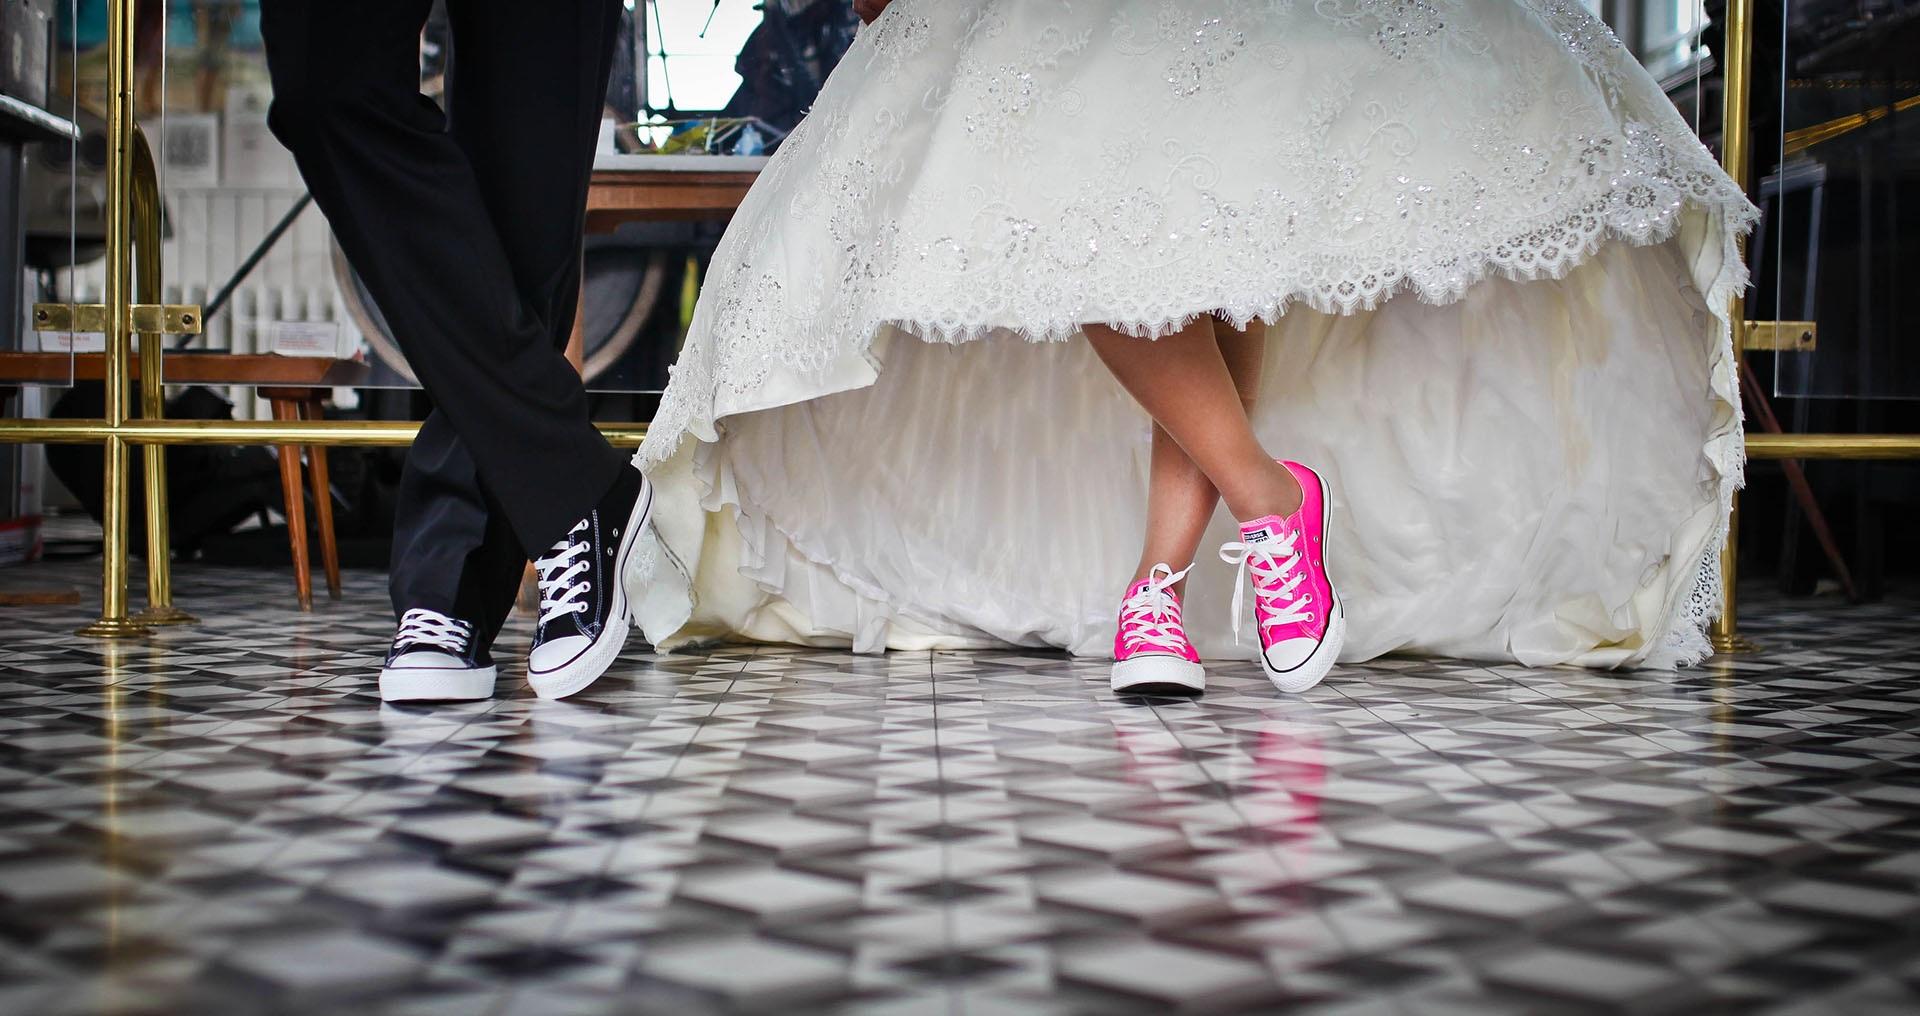 boda, original, zapatos, calzado, novios - Fondos de Pantalla HD - professor-falken.com